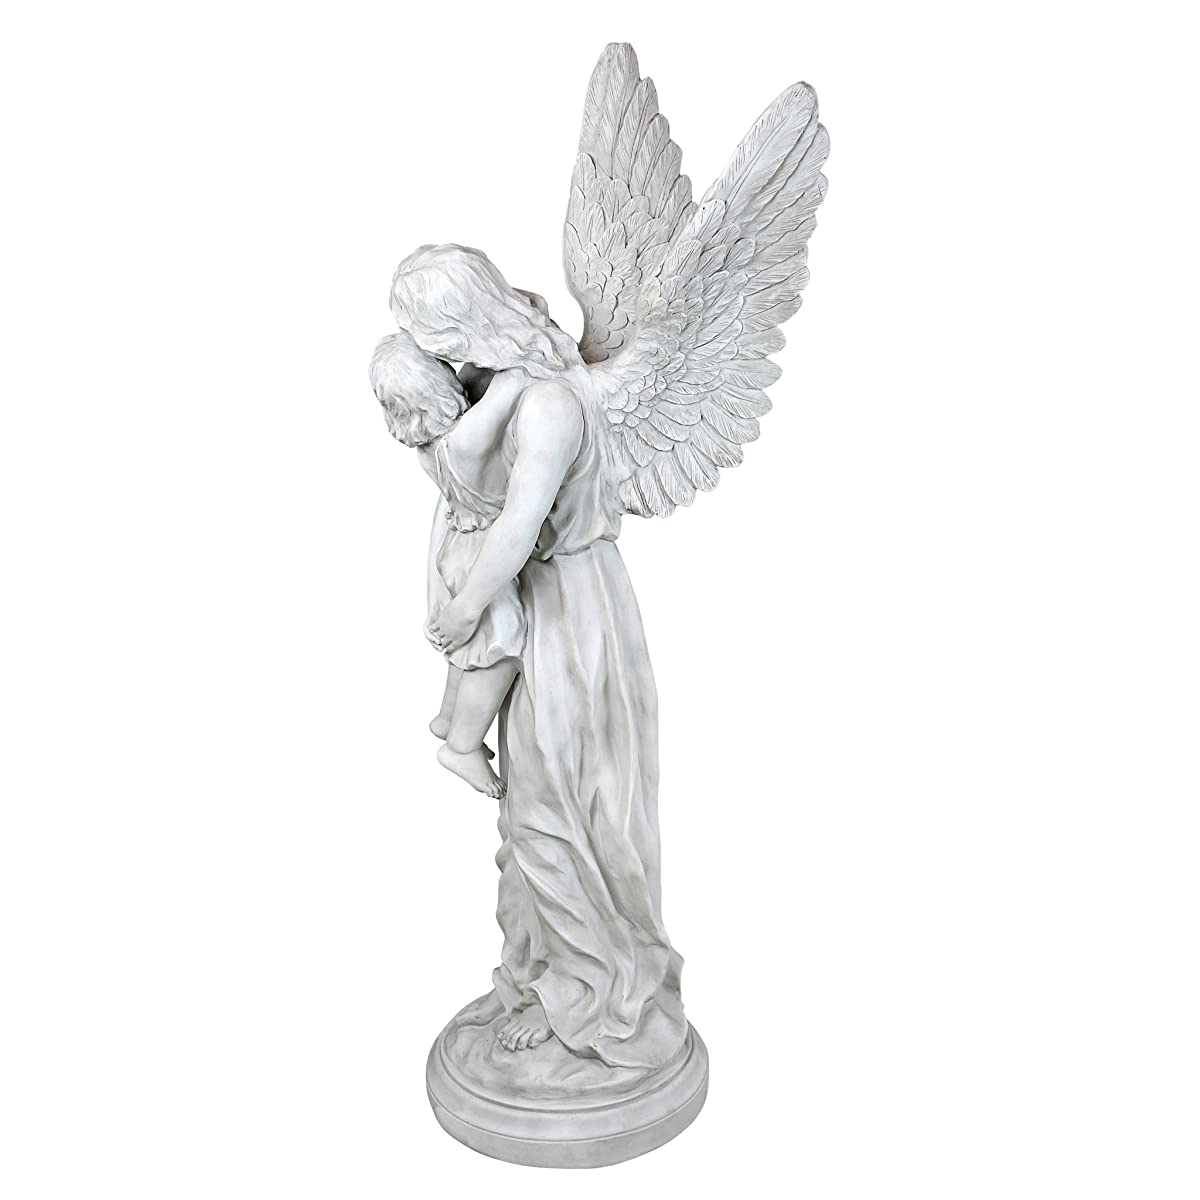 Design Toscano Heavens Guardian Angel Garden Statue, Antique Stone